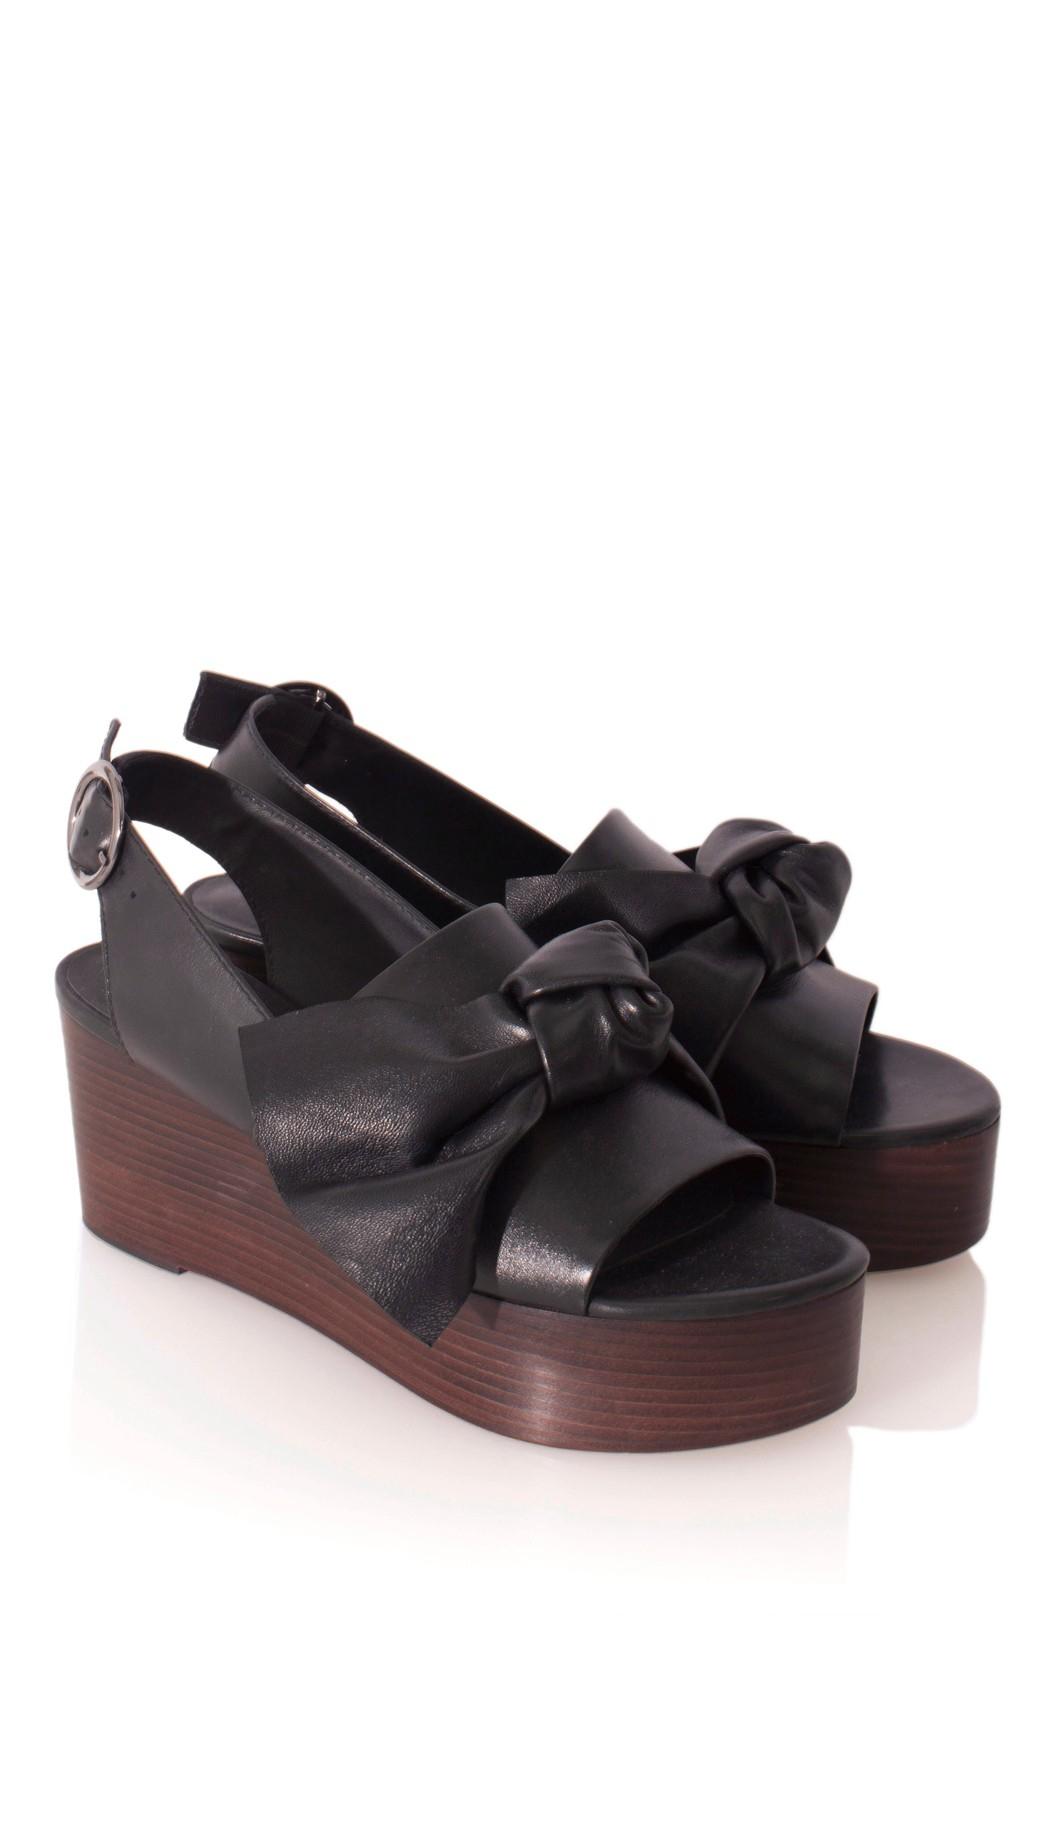 402d6b9a6e0 Lyst - Tibi Estel Platform Sandals in Black